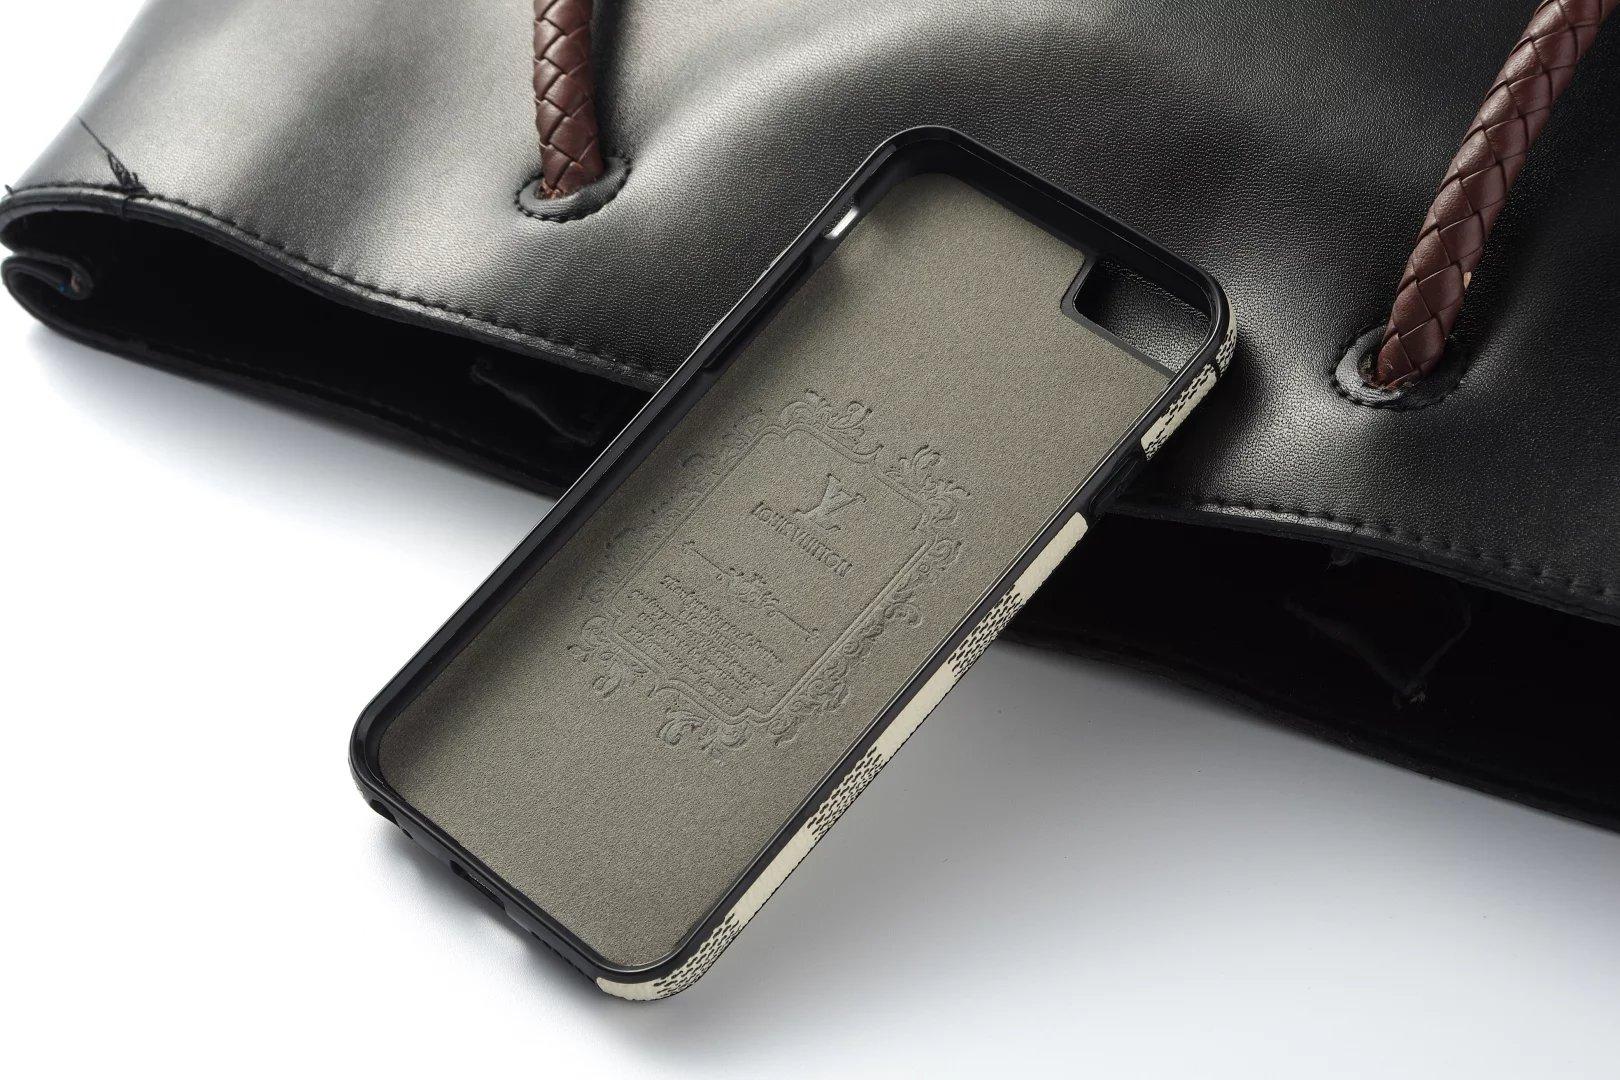 iphone silikonhülle selbst gestalten iphone hülle selber machen Burberry iphone6s hülle iphone 6s handytasche schutzhülle iphone 3gs handy bumper 6slbst gestalten iphone handytasche iphone ca6s gestalten das neue iphone 6 video